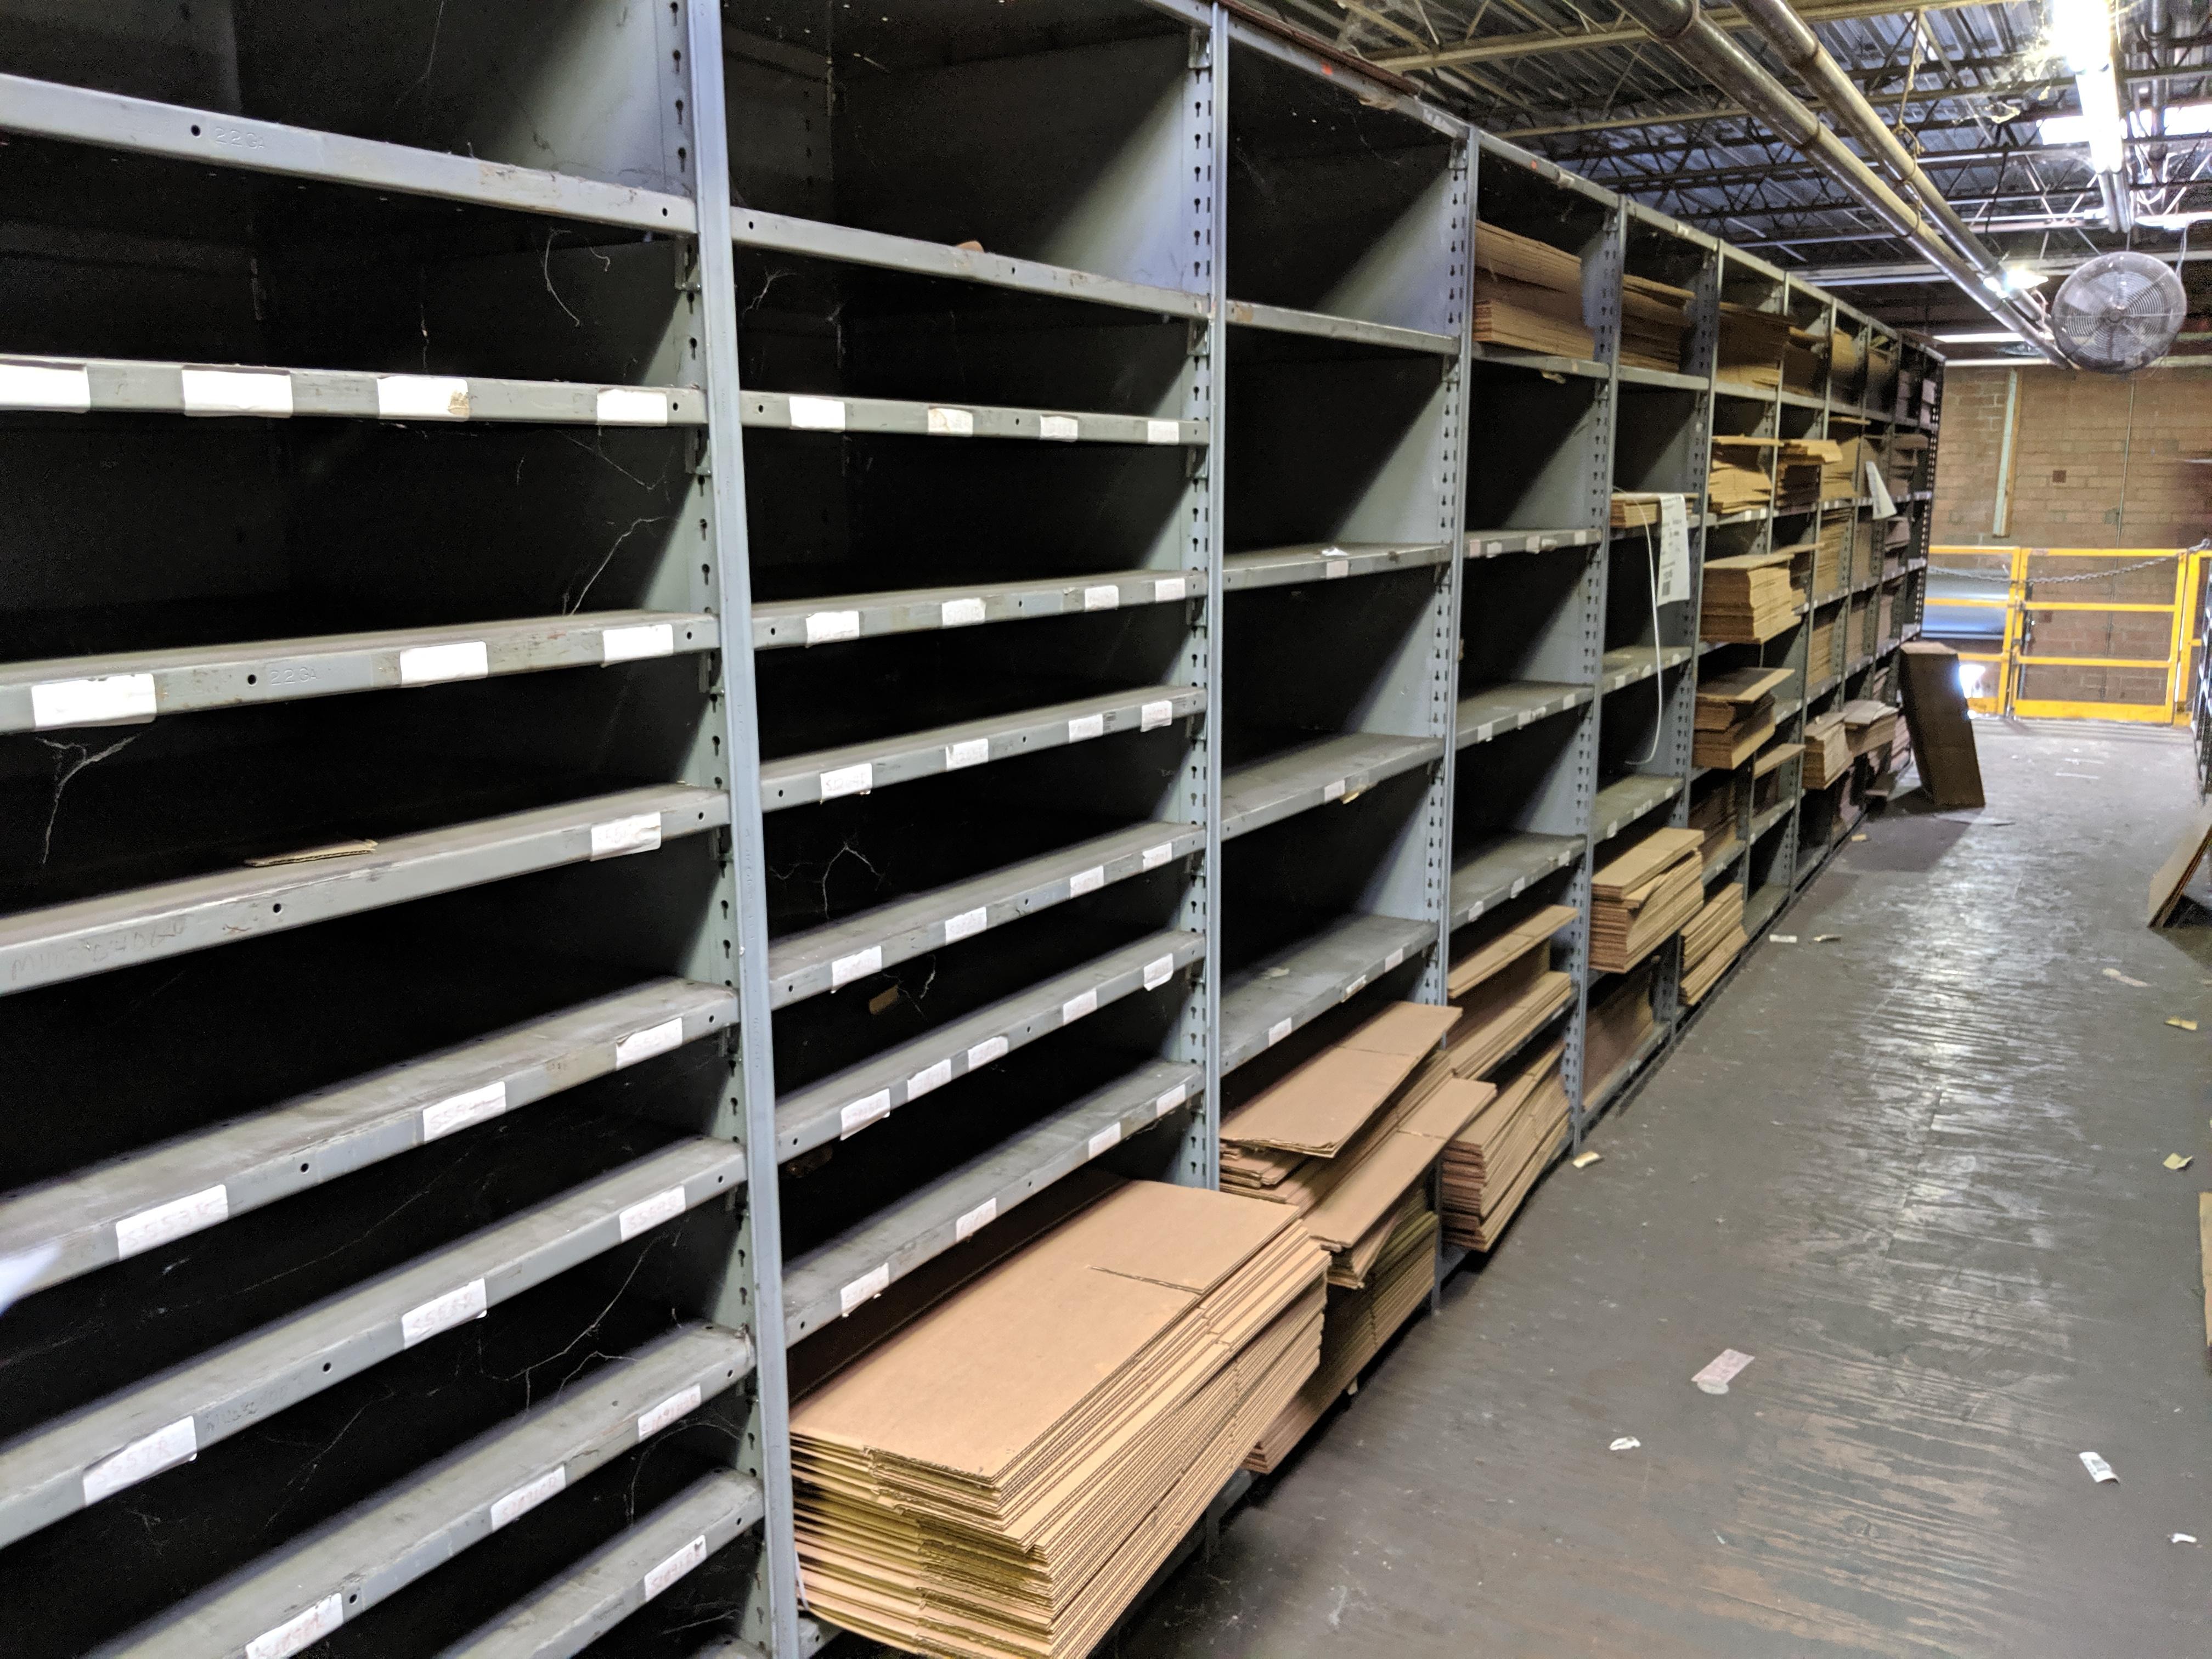 Parts shelving units - Image 5 of 7